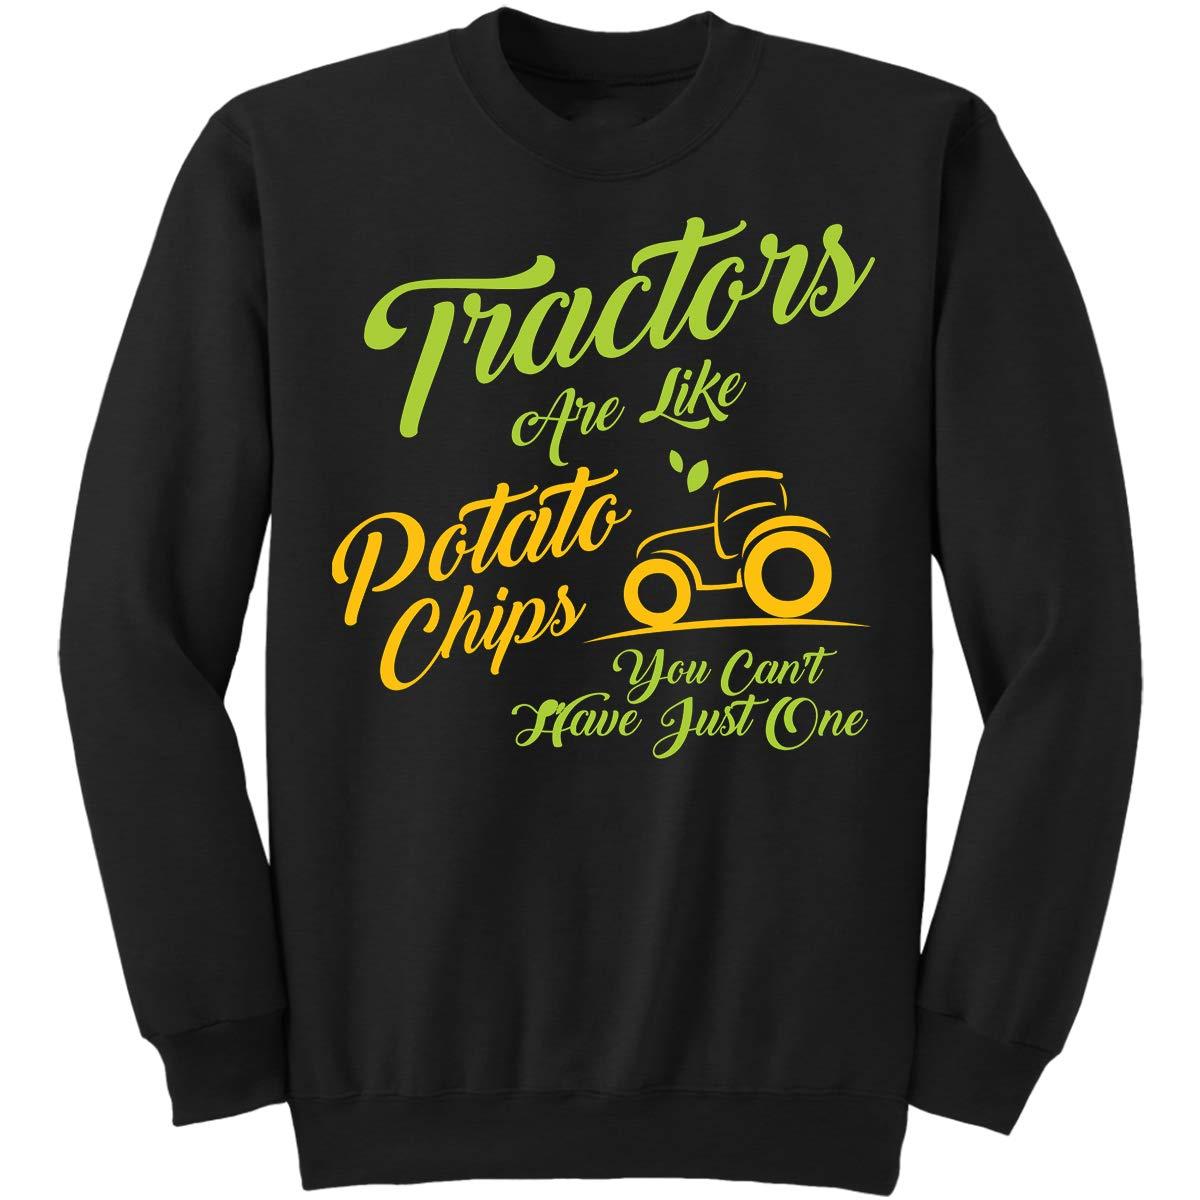 Love Tractor Funny F Sweatshirt Tractor are Like